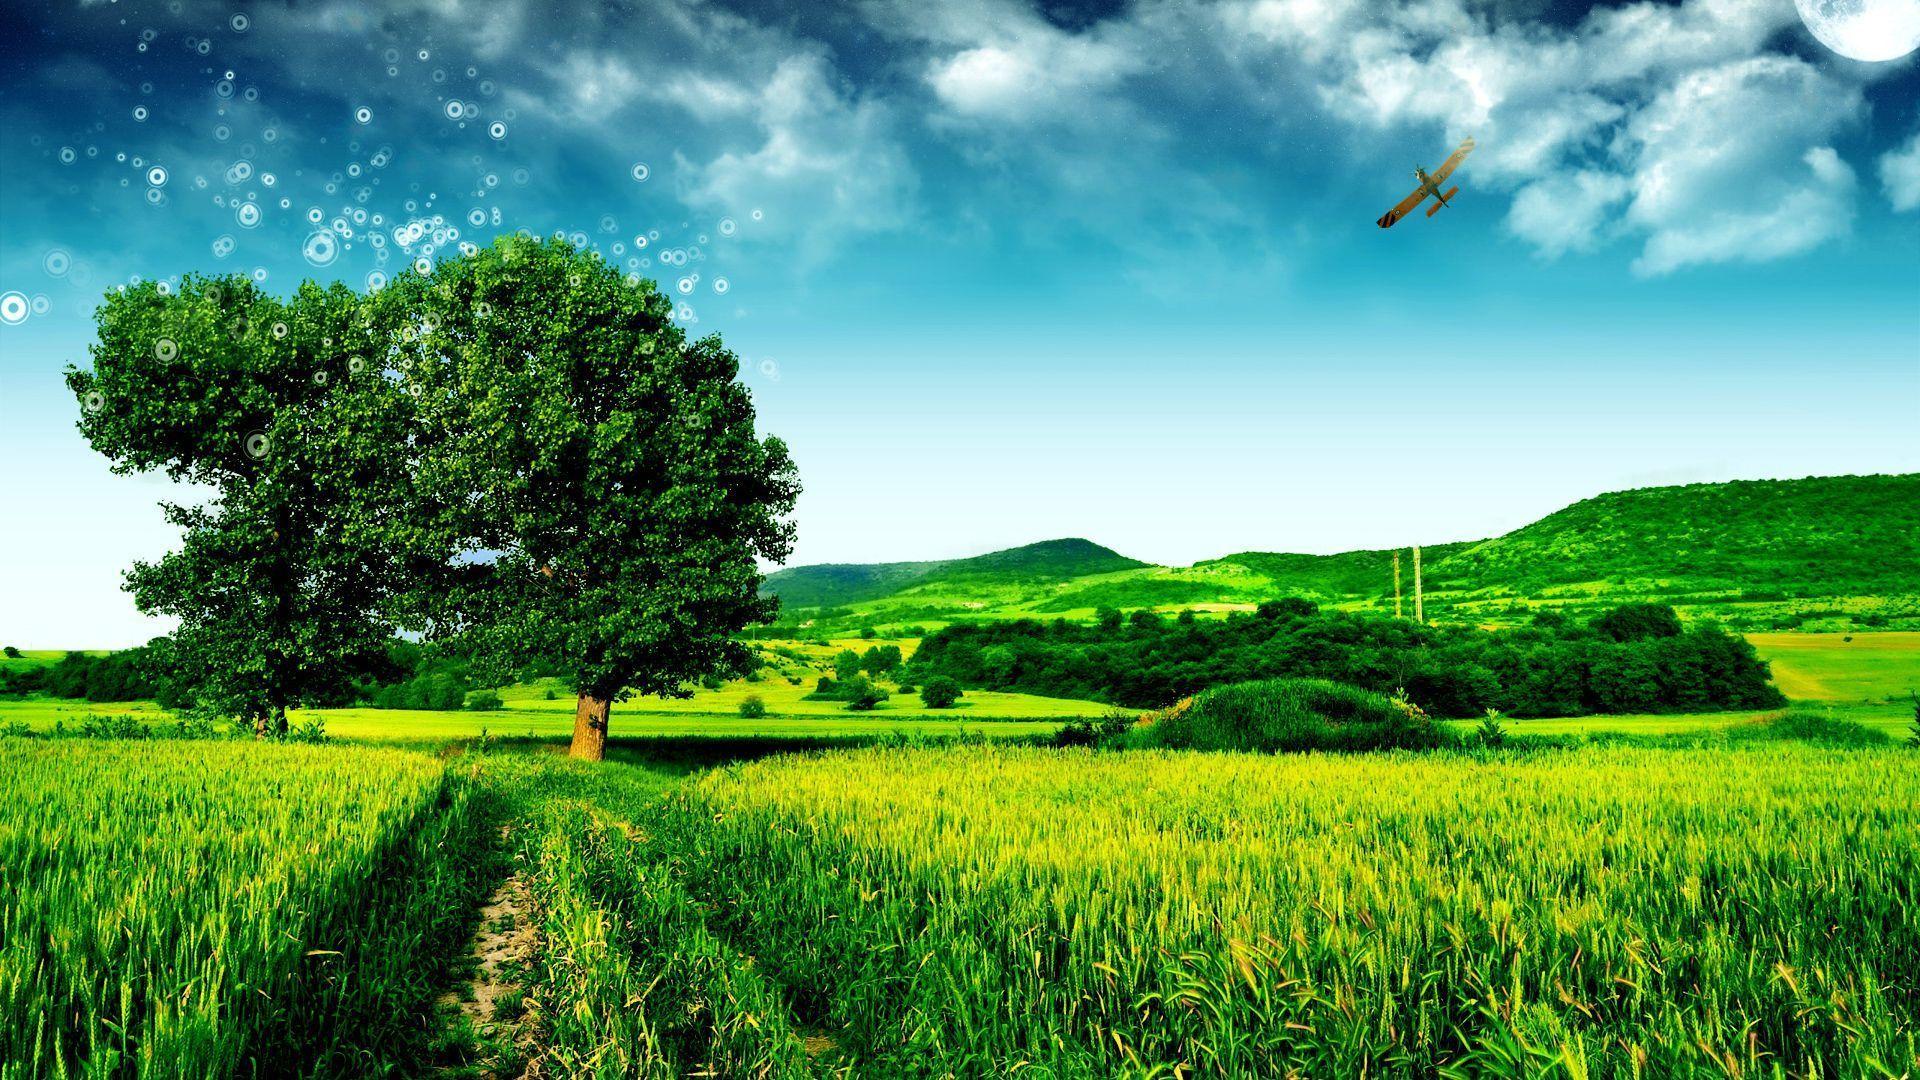 Landscape Background - WallpaperSafari